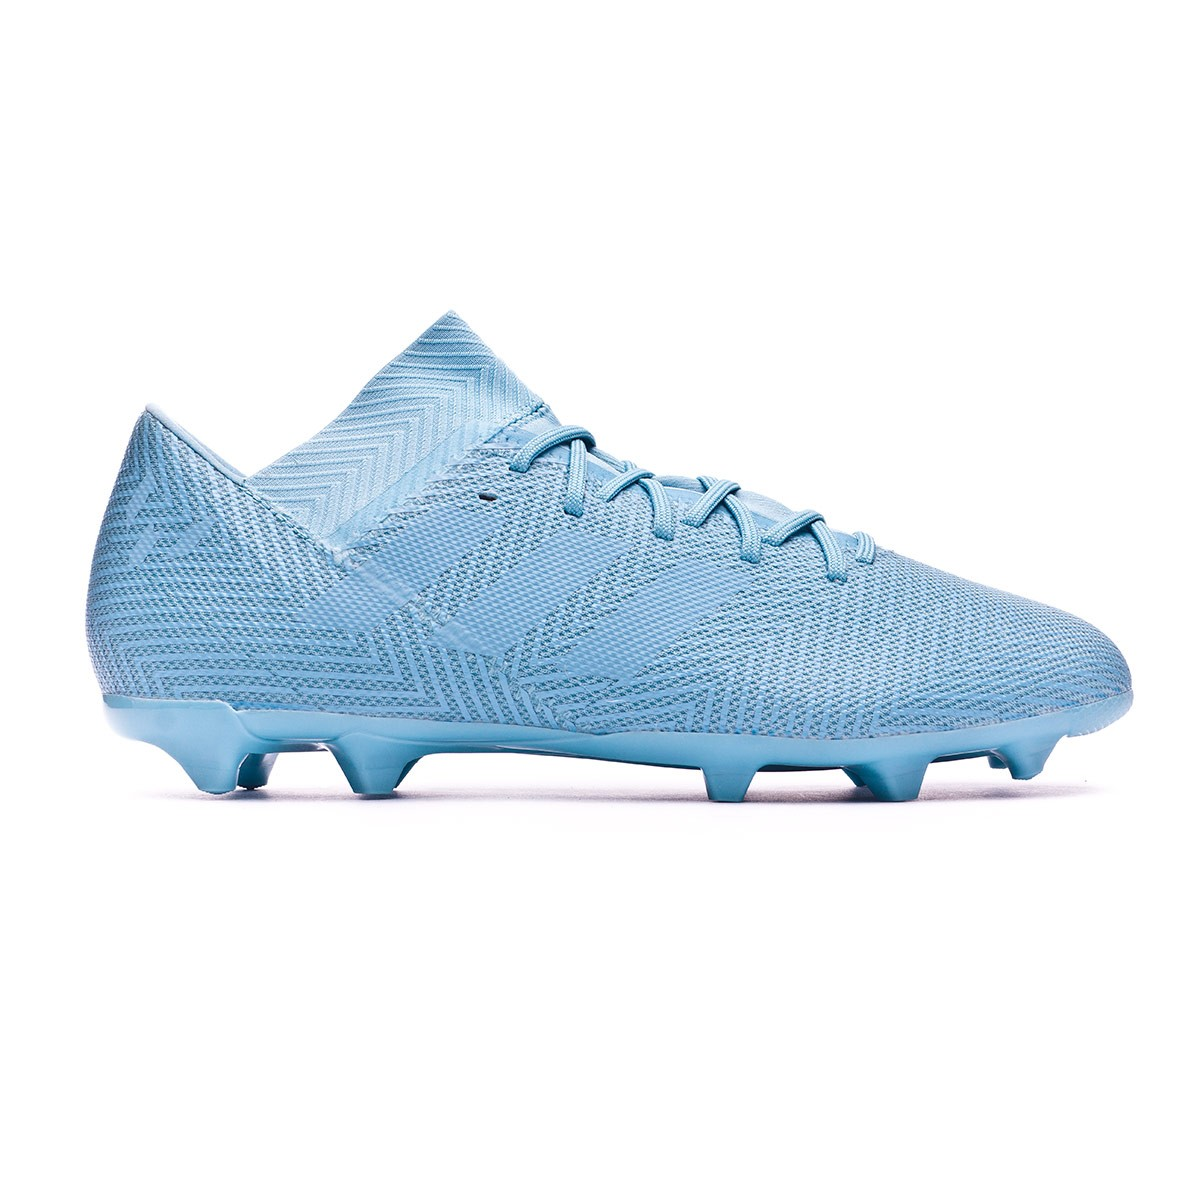 253cb8a8faad Football Boots adidas Nemeziz Messi 18.3 FG Ash blue-Raw grey - Tienda de  fútbol Fútbol Emotion